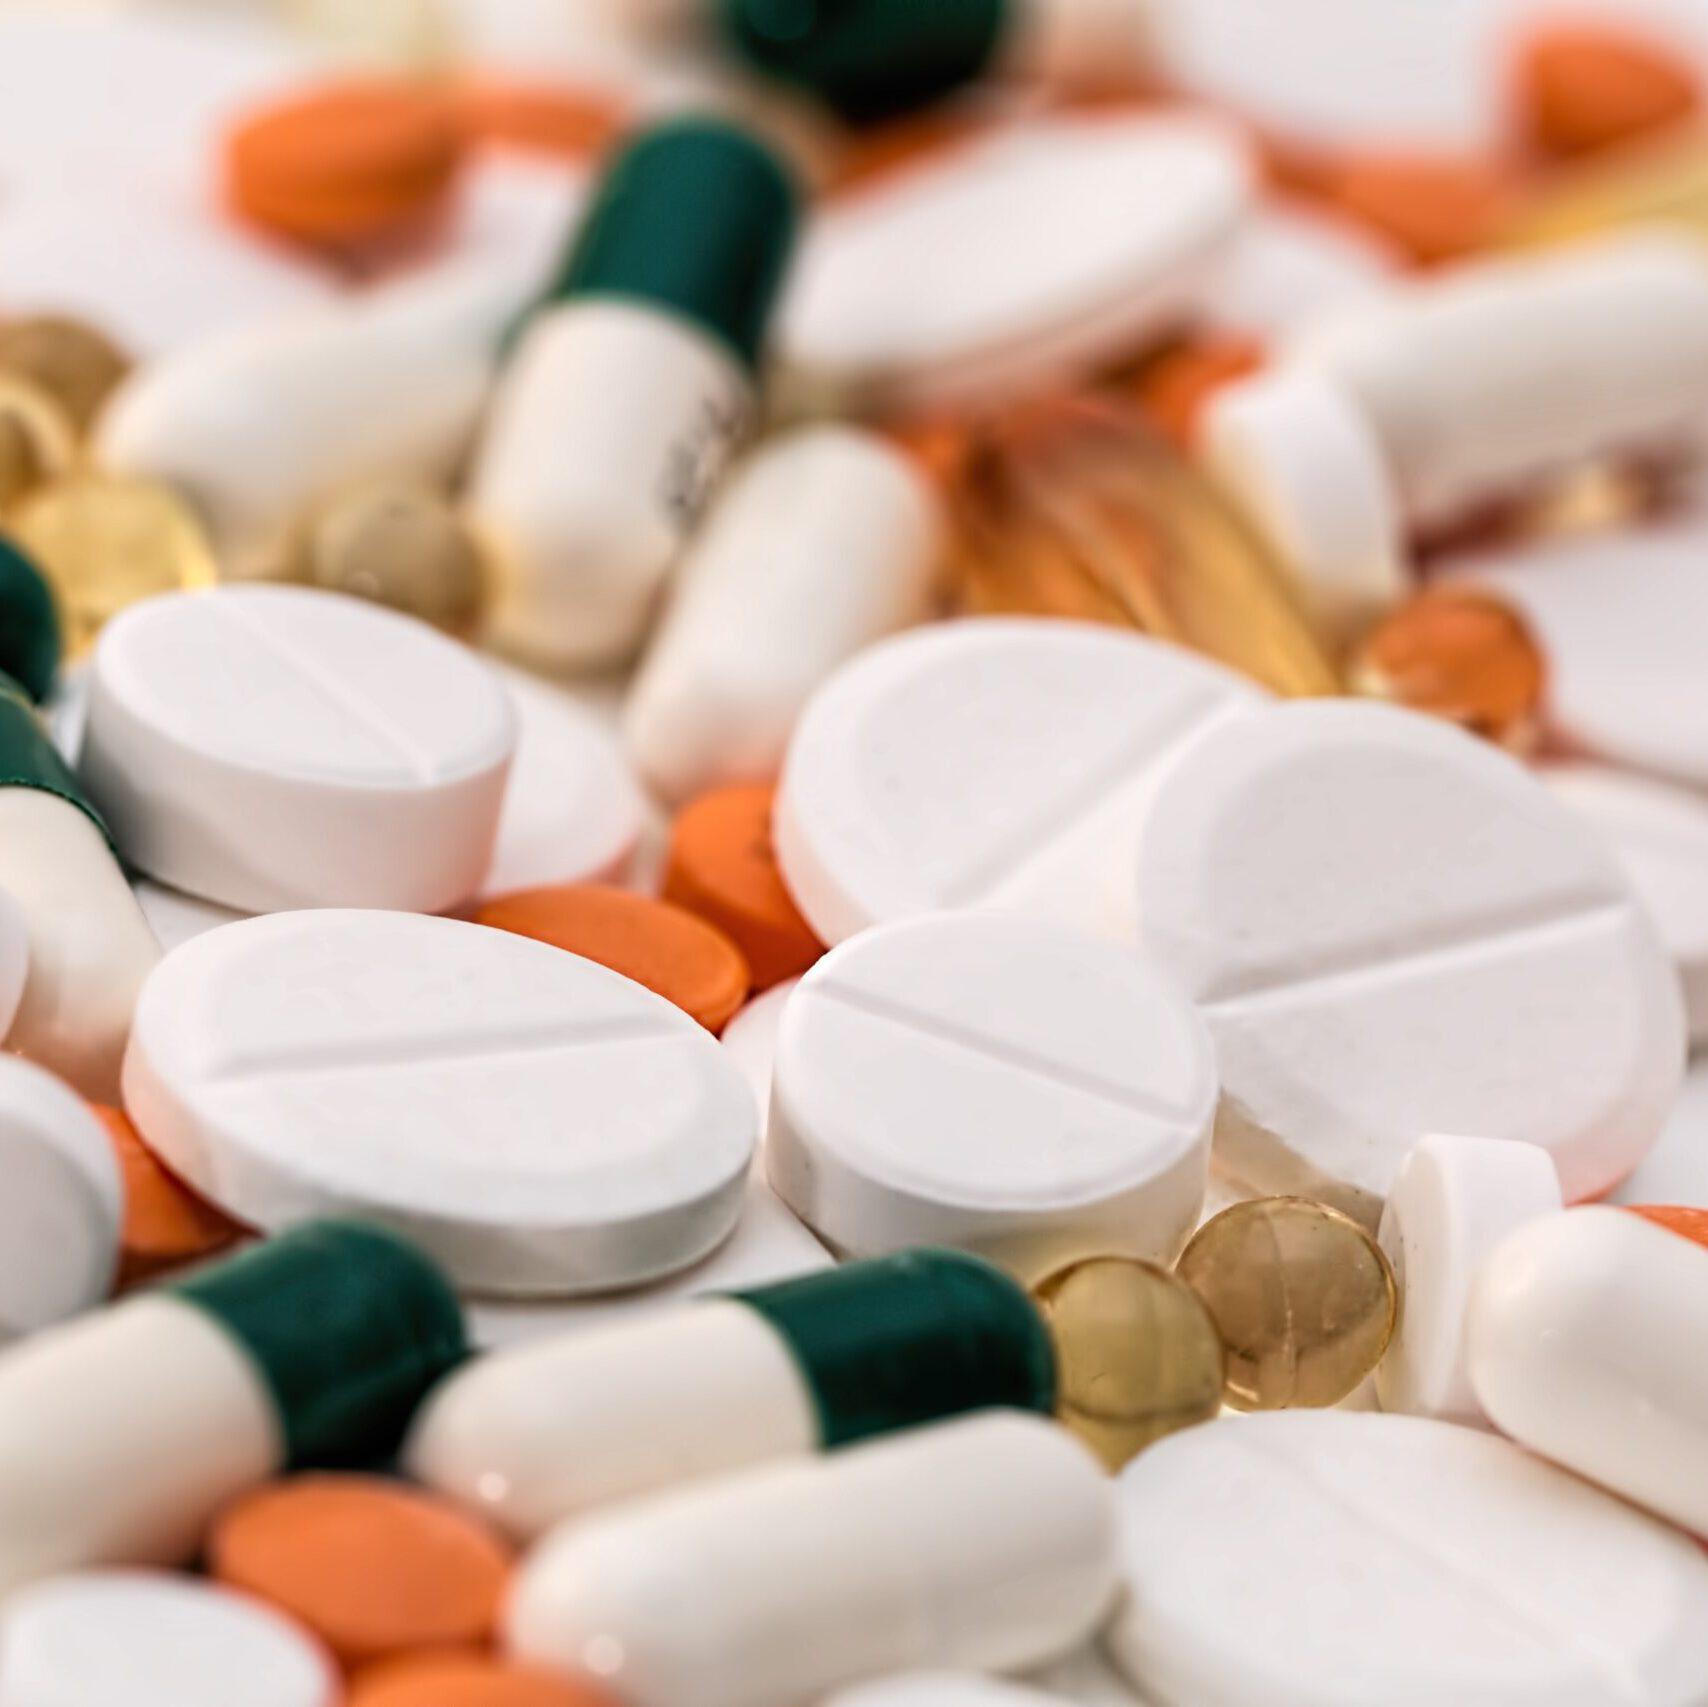 Drogenanalytik